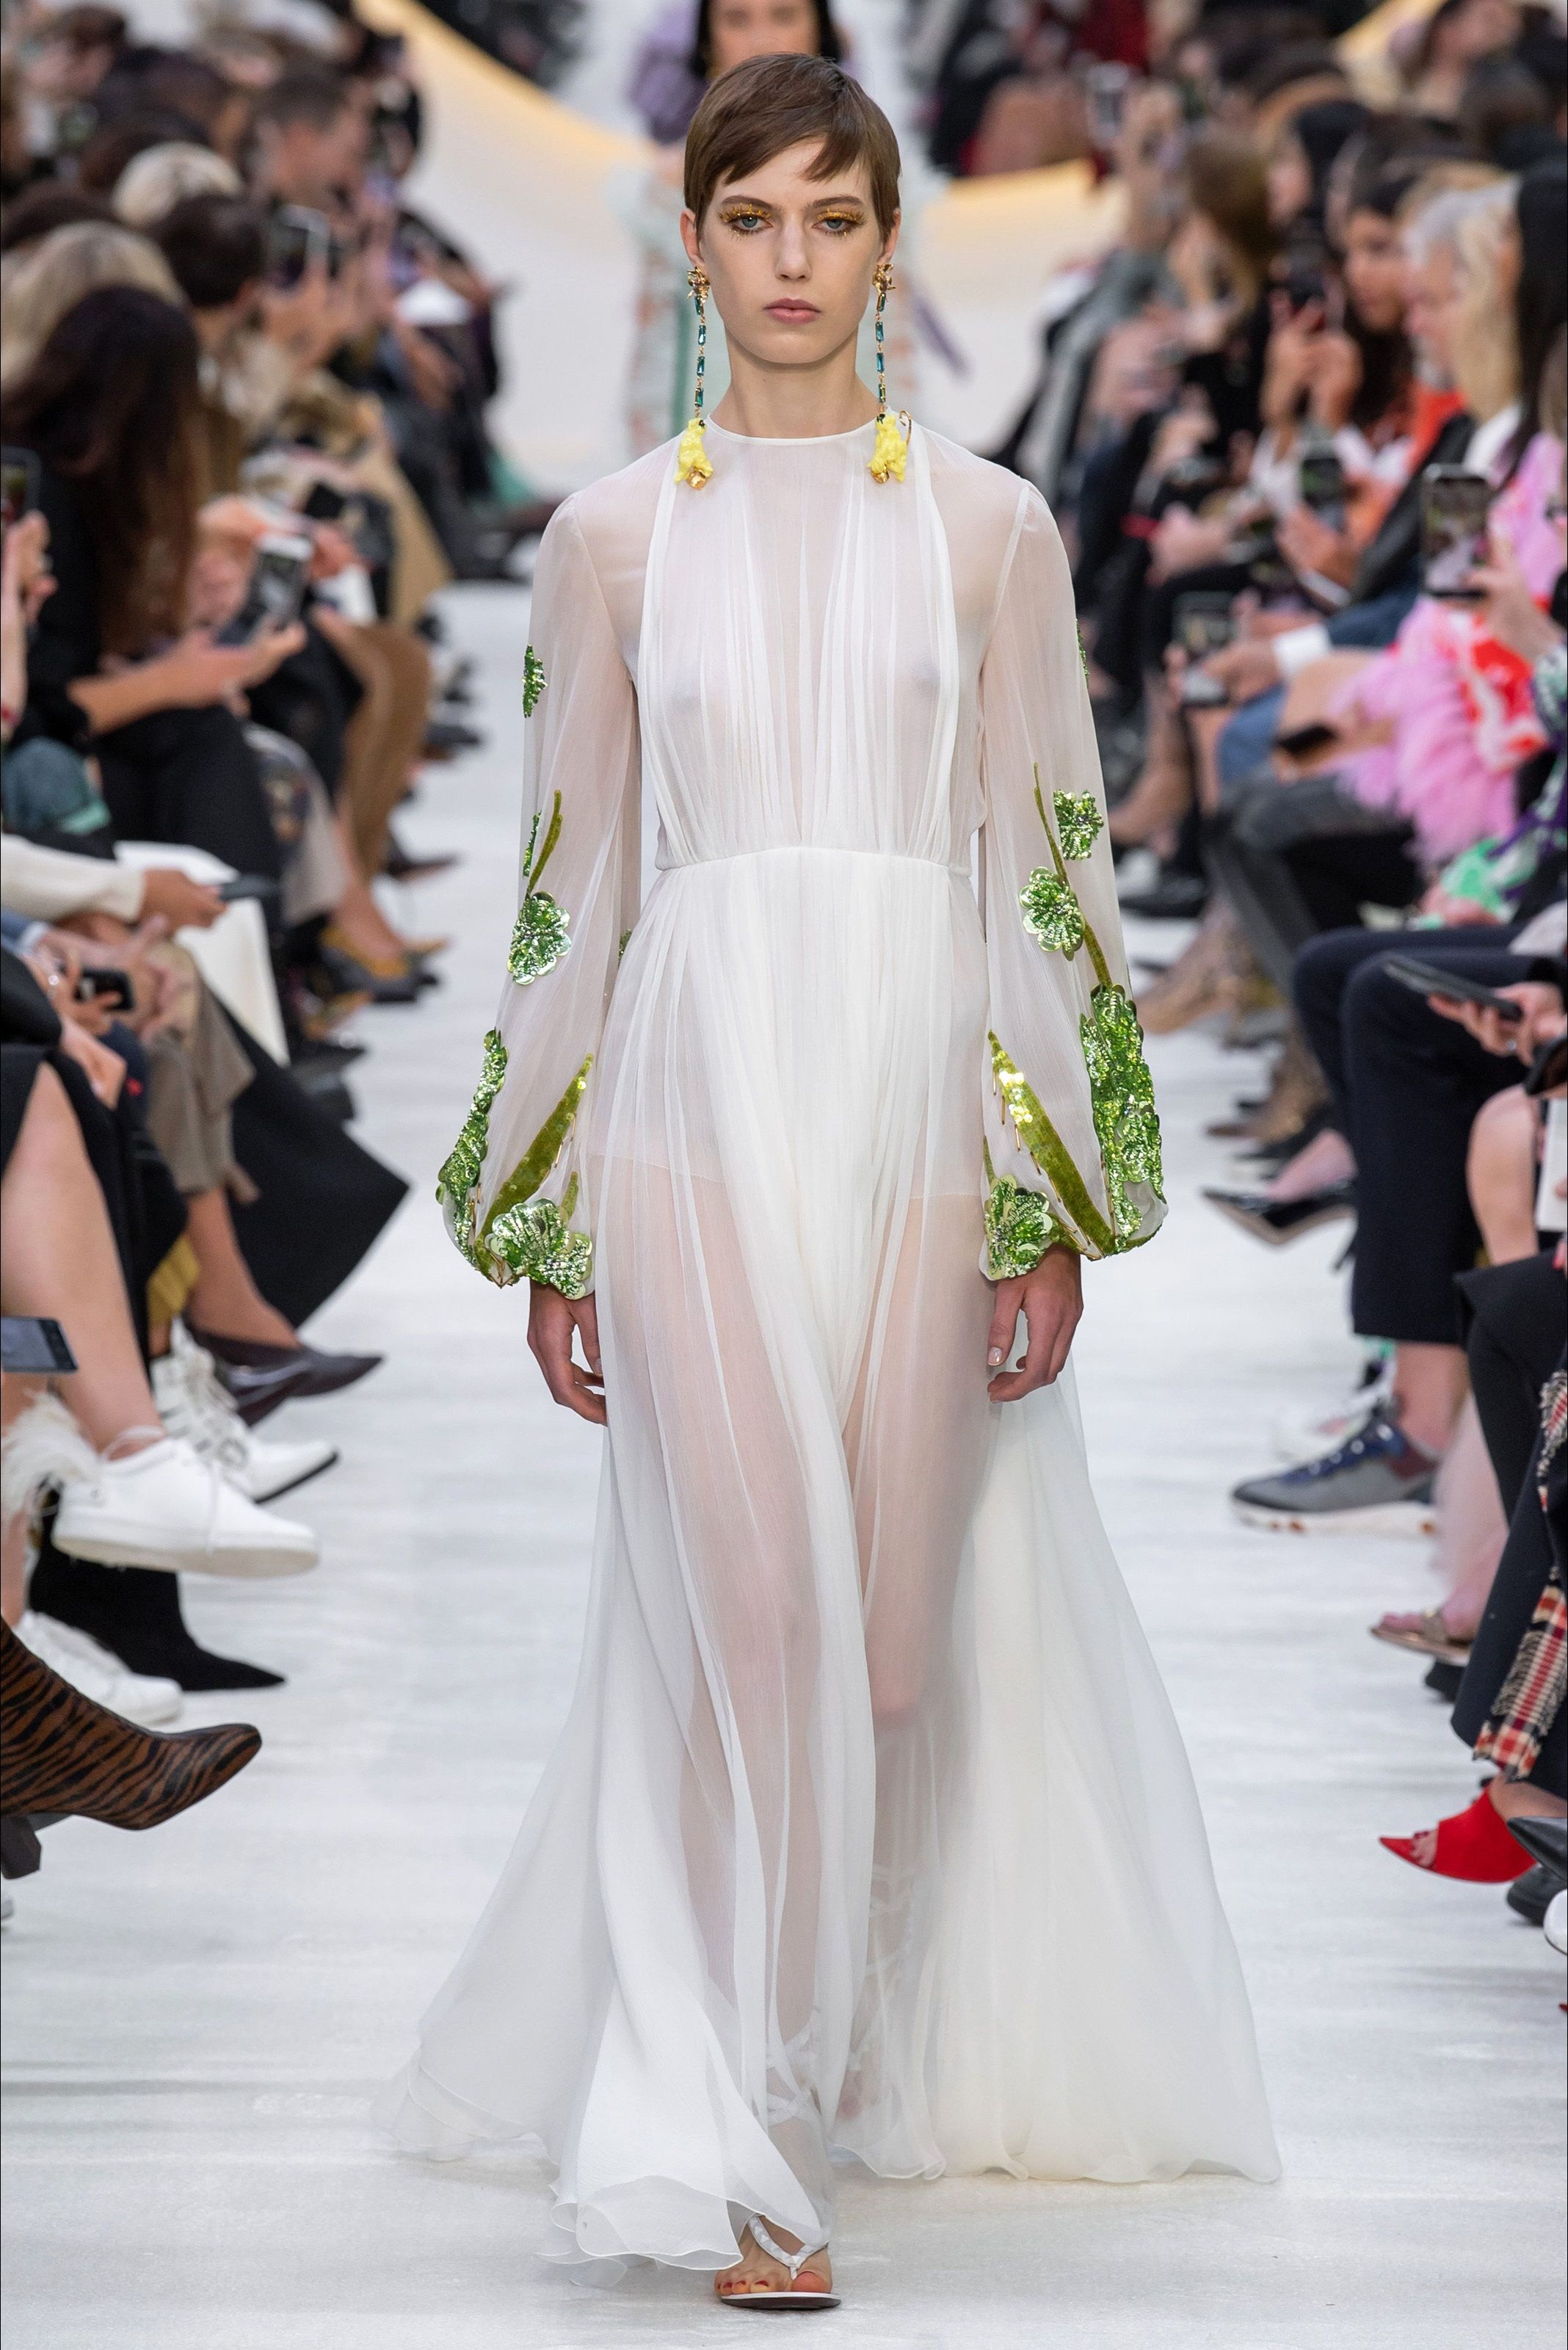 Vestiti Eleganti Valentino.Valentino Spring Summer 2020 Fashion Fashion Show Catwalk Fashion